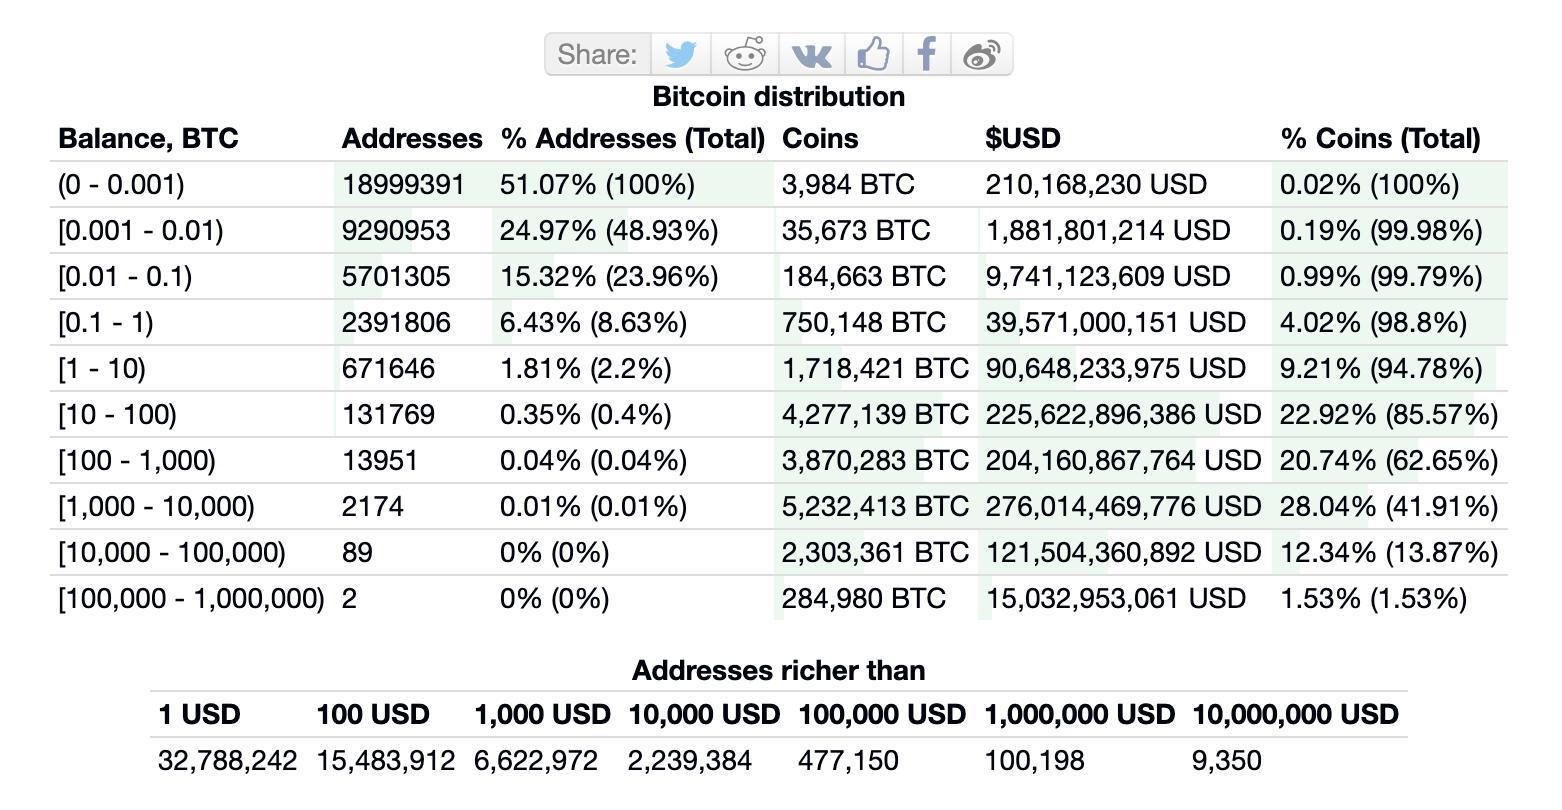 Bitcoin Wealth Distribution